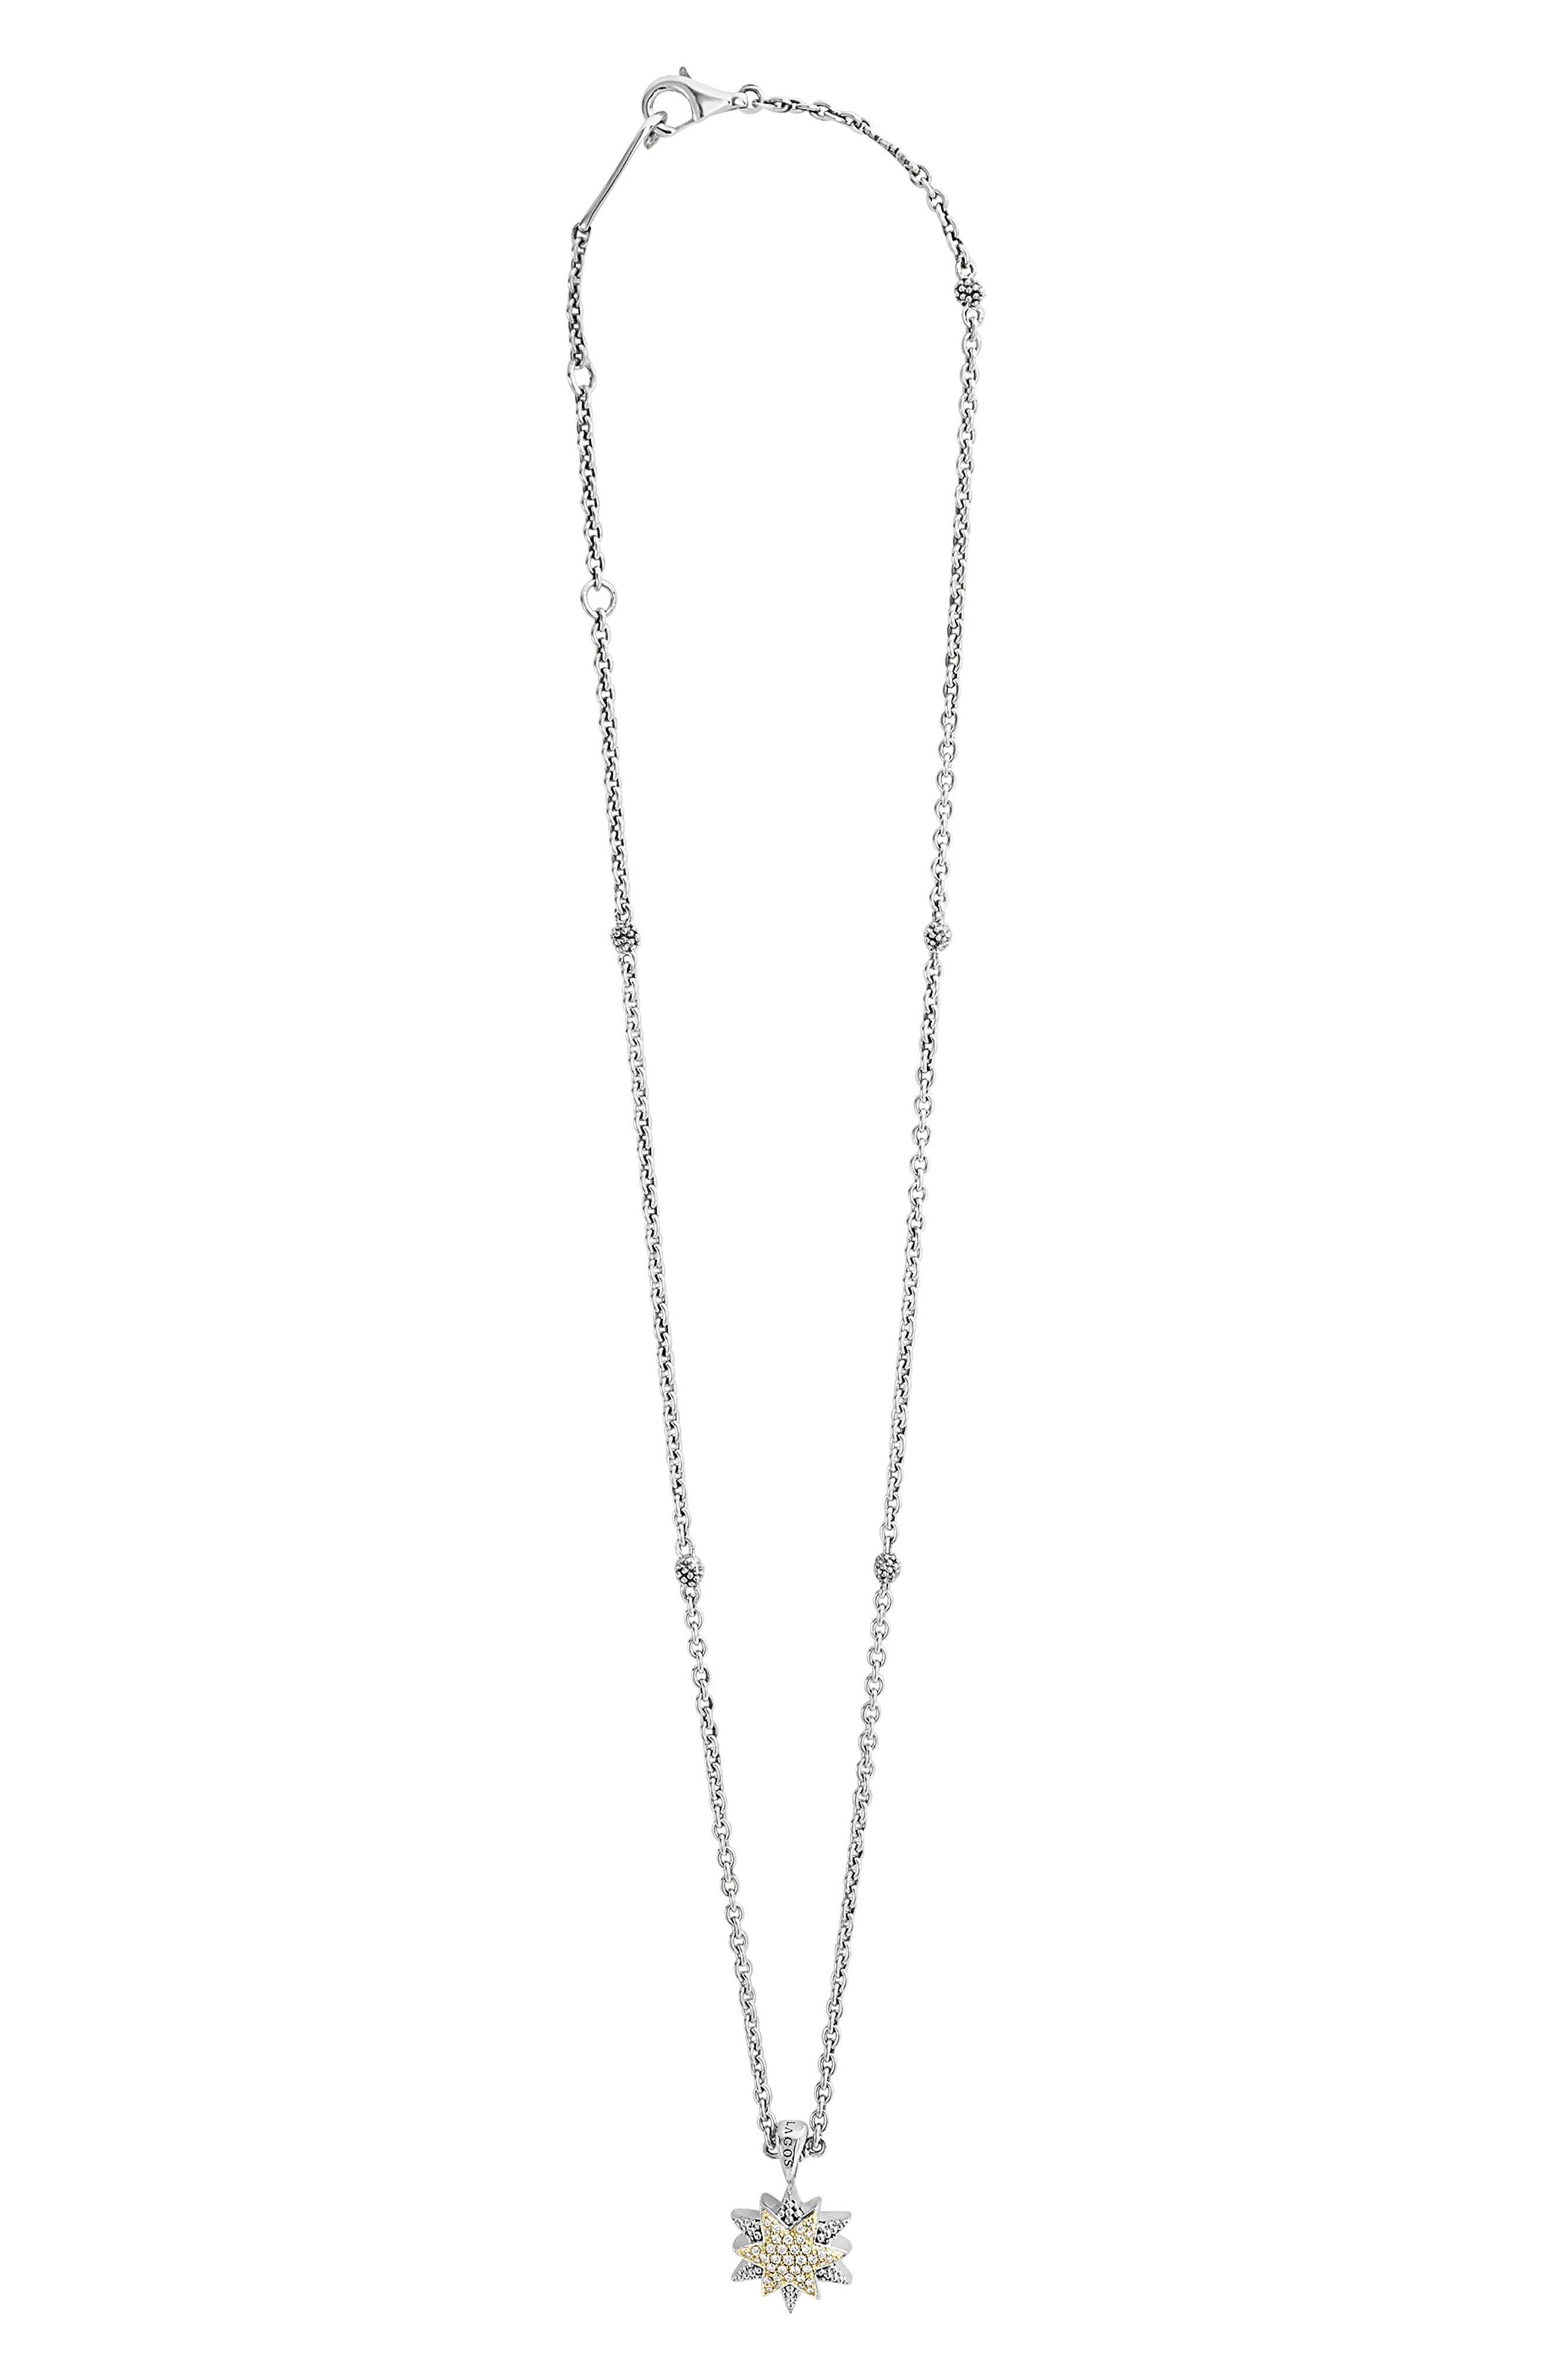 North Star Small Diamond Pendant Necklace,                         Main,                         color, Diamond